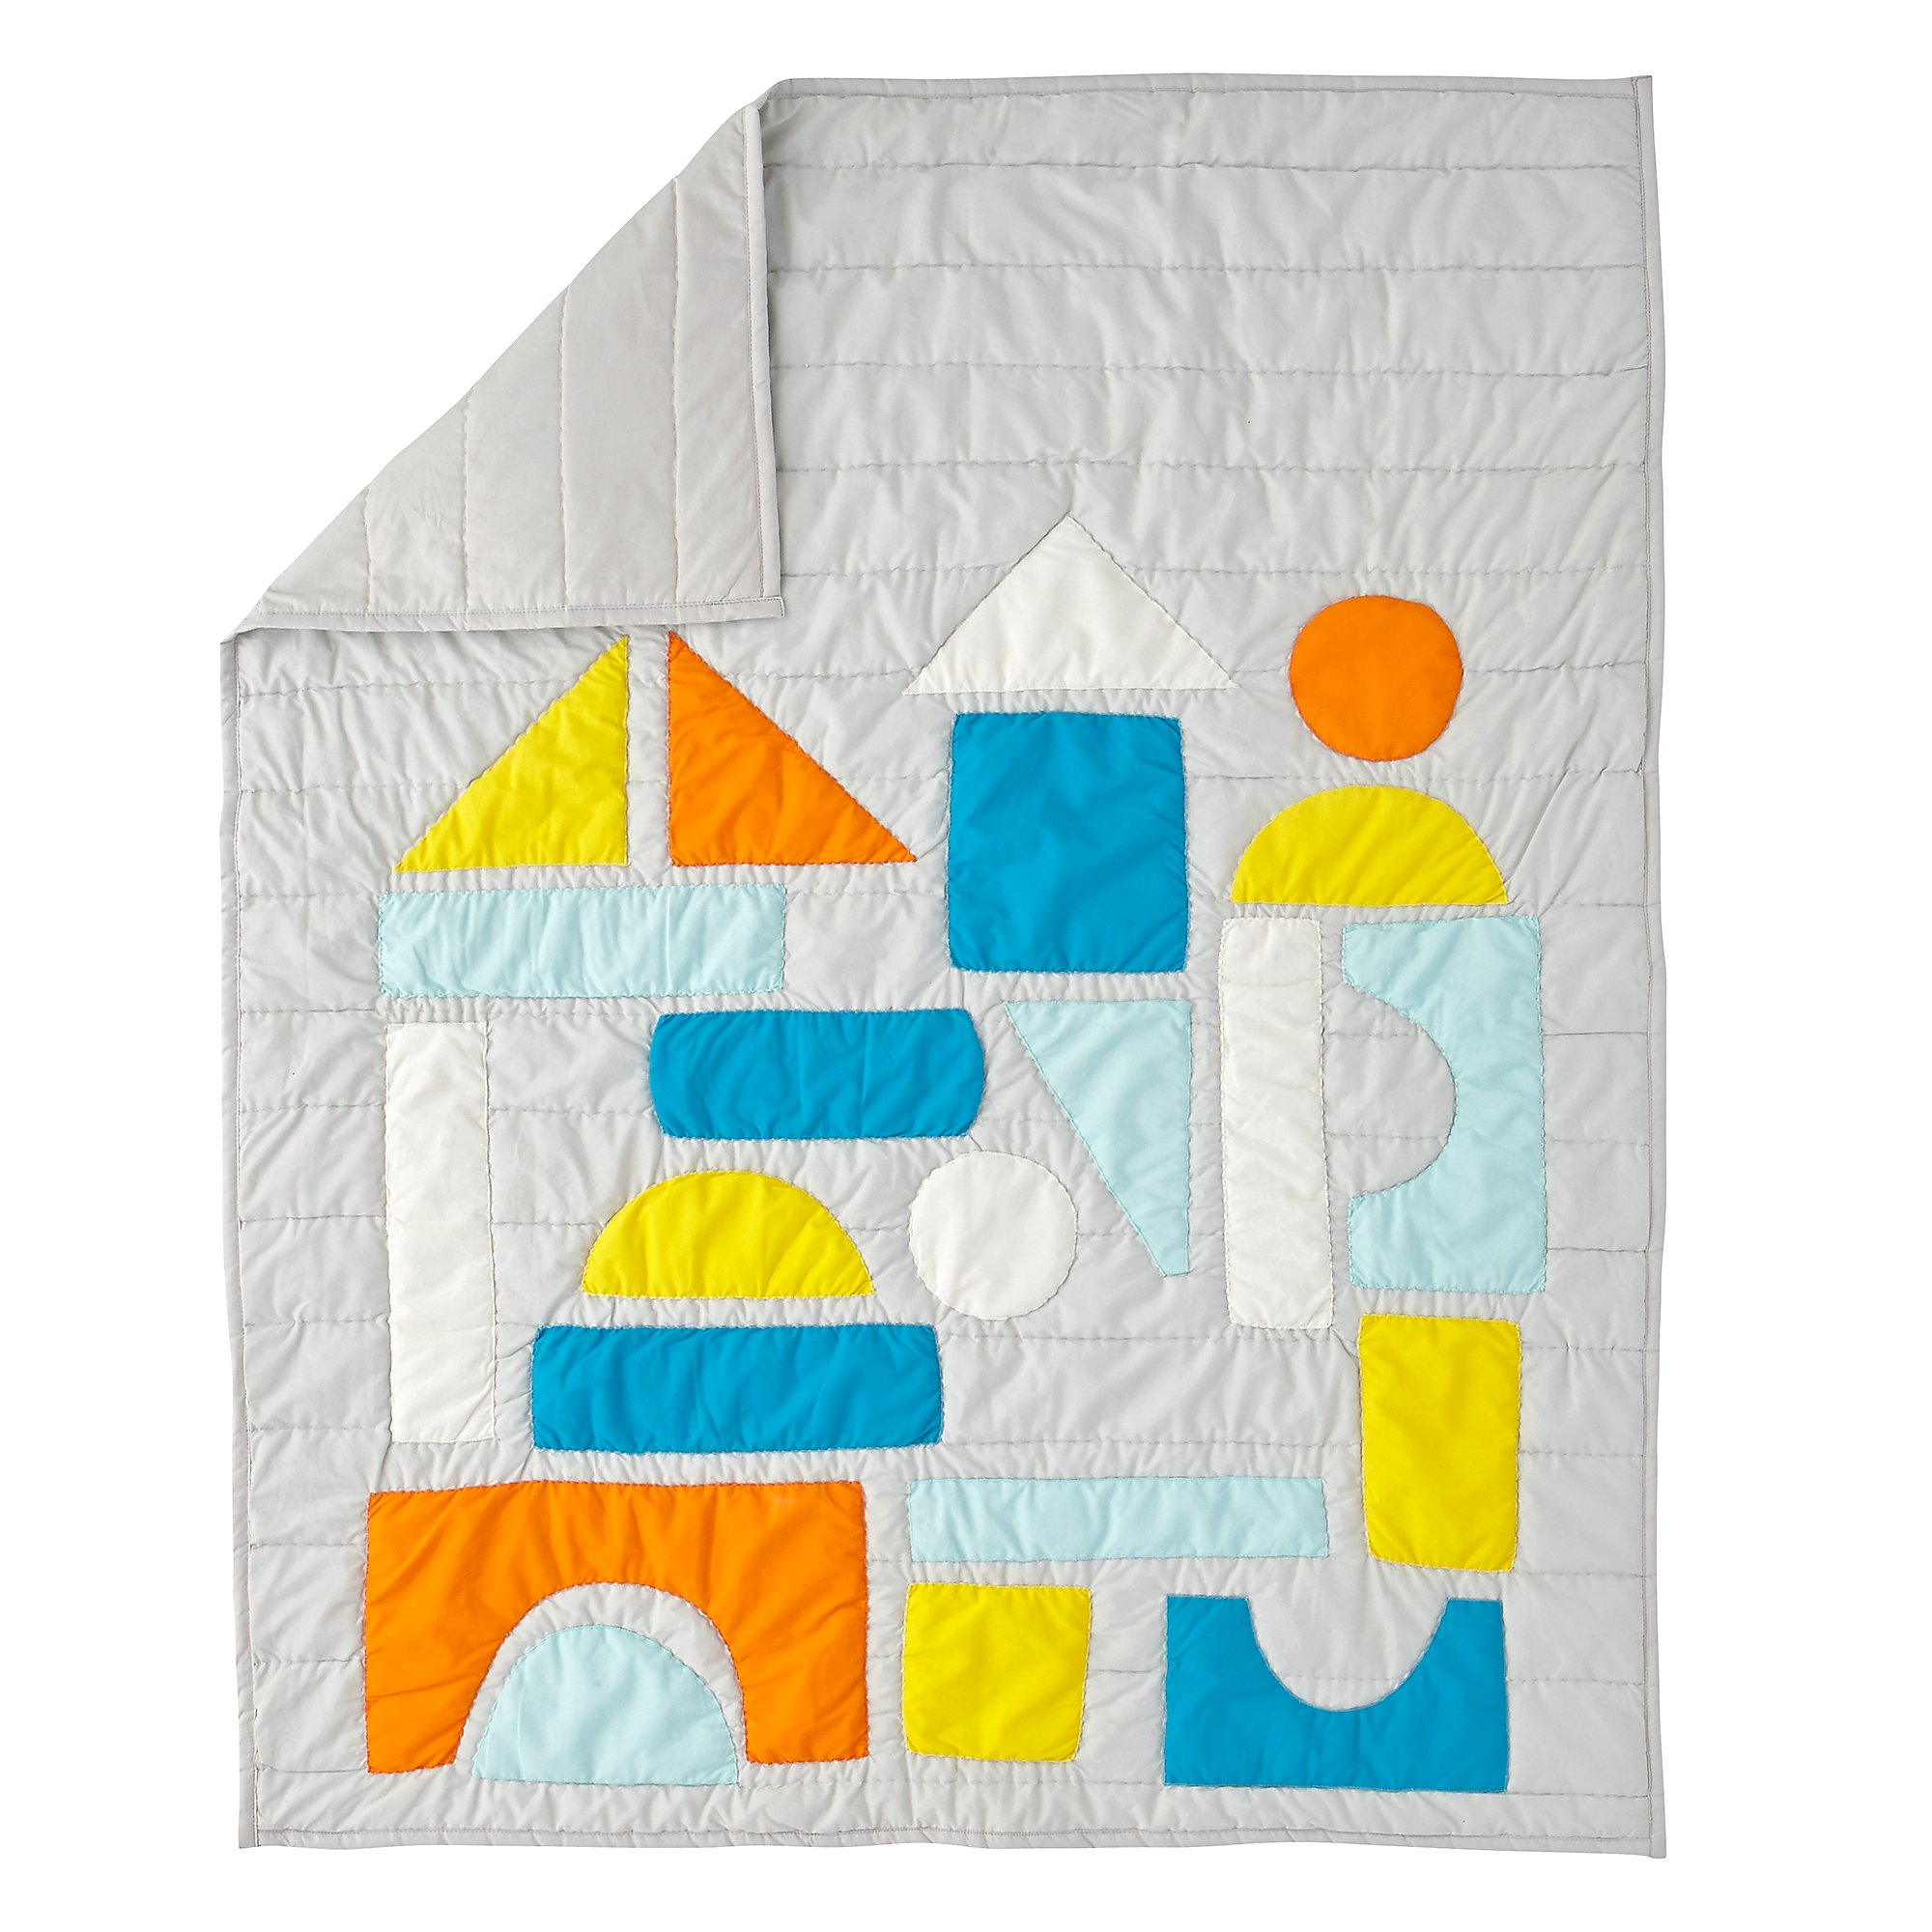 block-party-baby-quilt.jpg